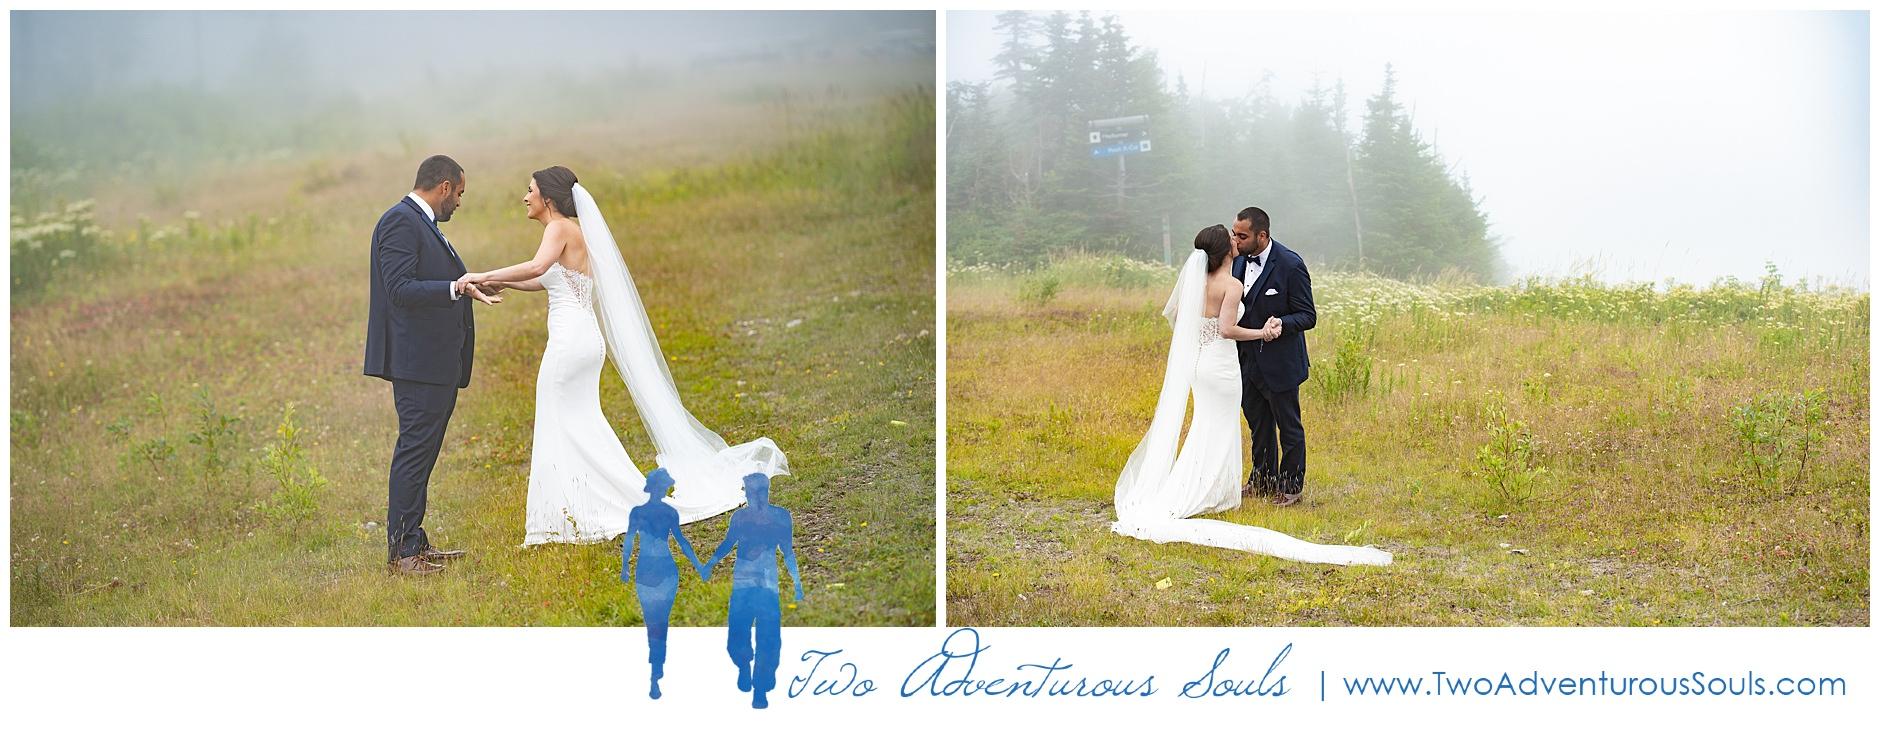 Sugarloaf Outdoor Center Wedding Photographers, Destination Wedding Photographers, Two Adventurous Souls-081719_0020.jpg